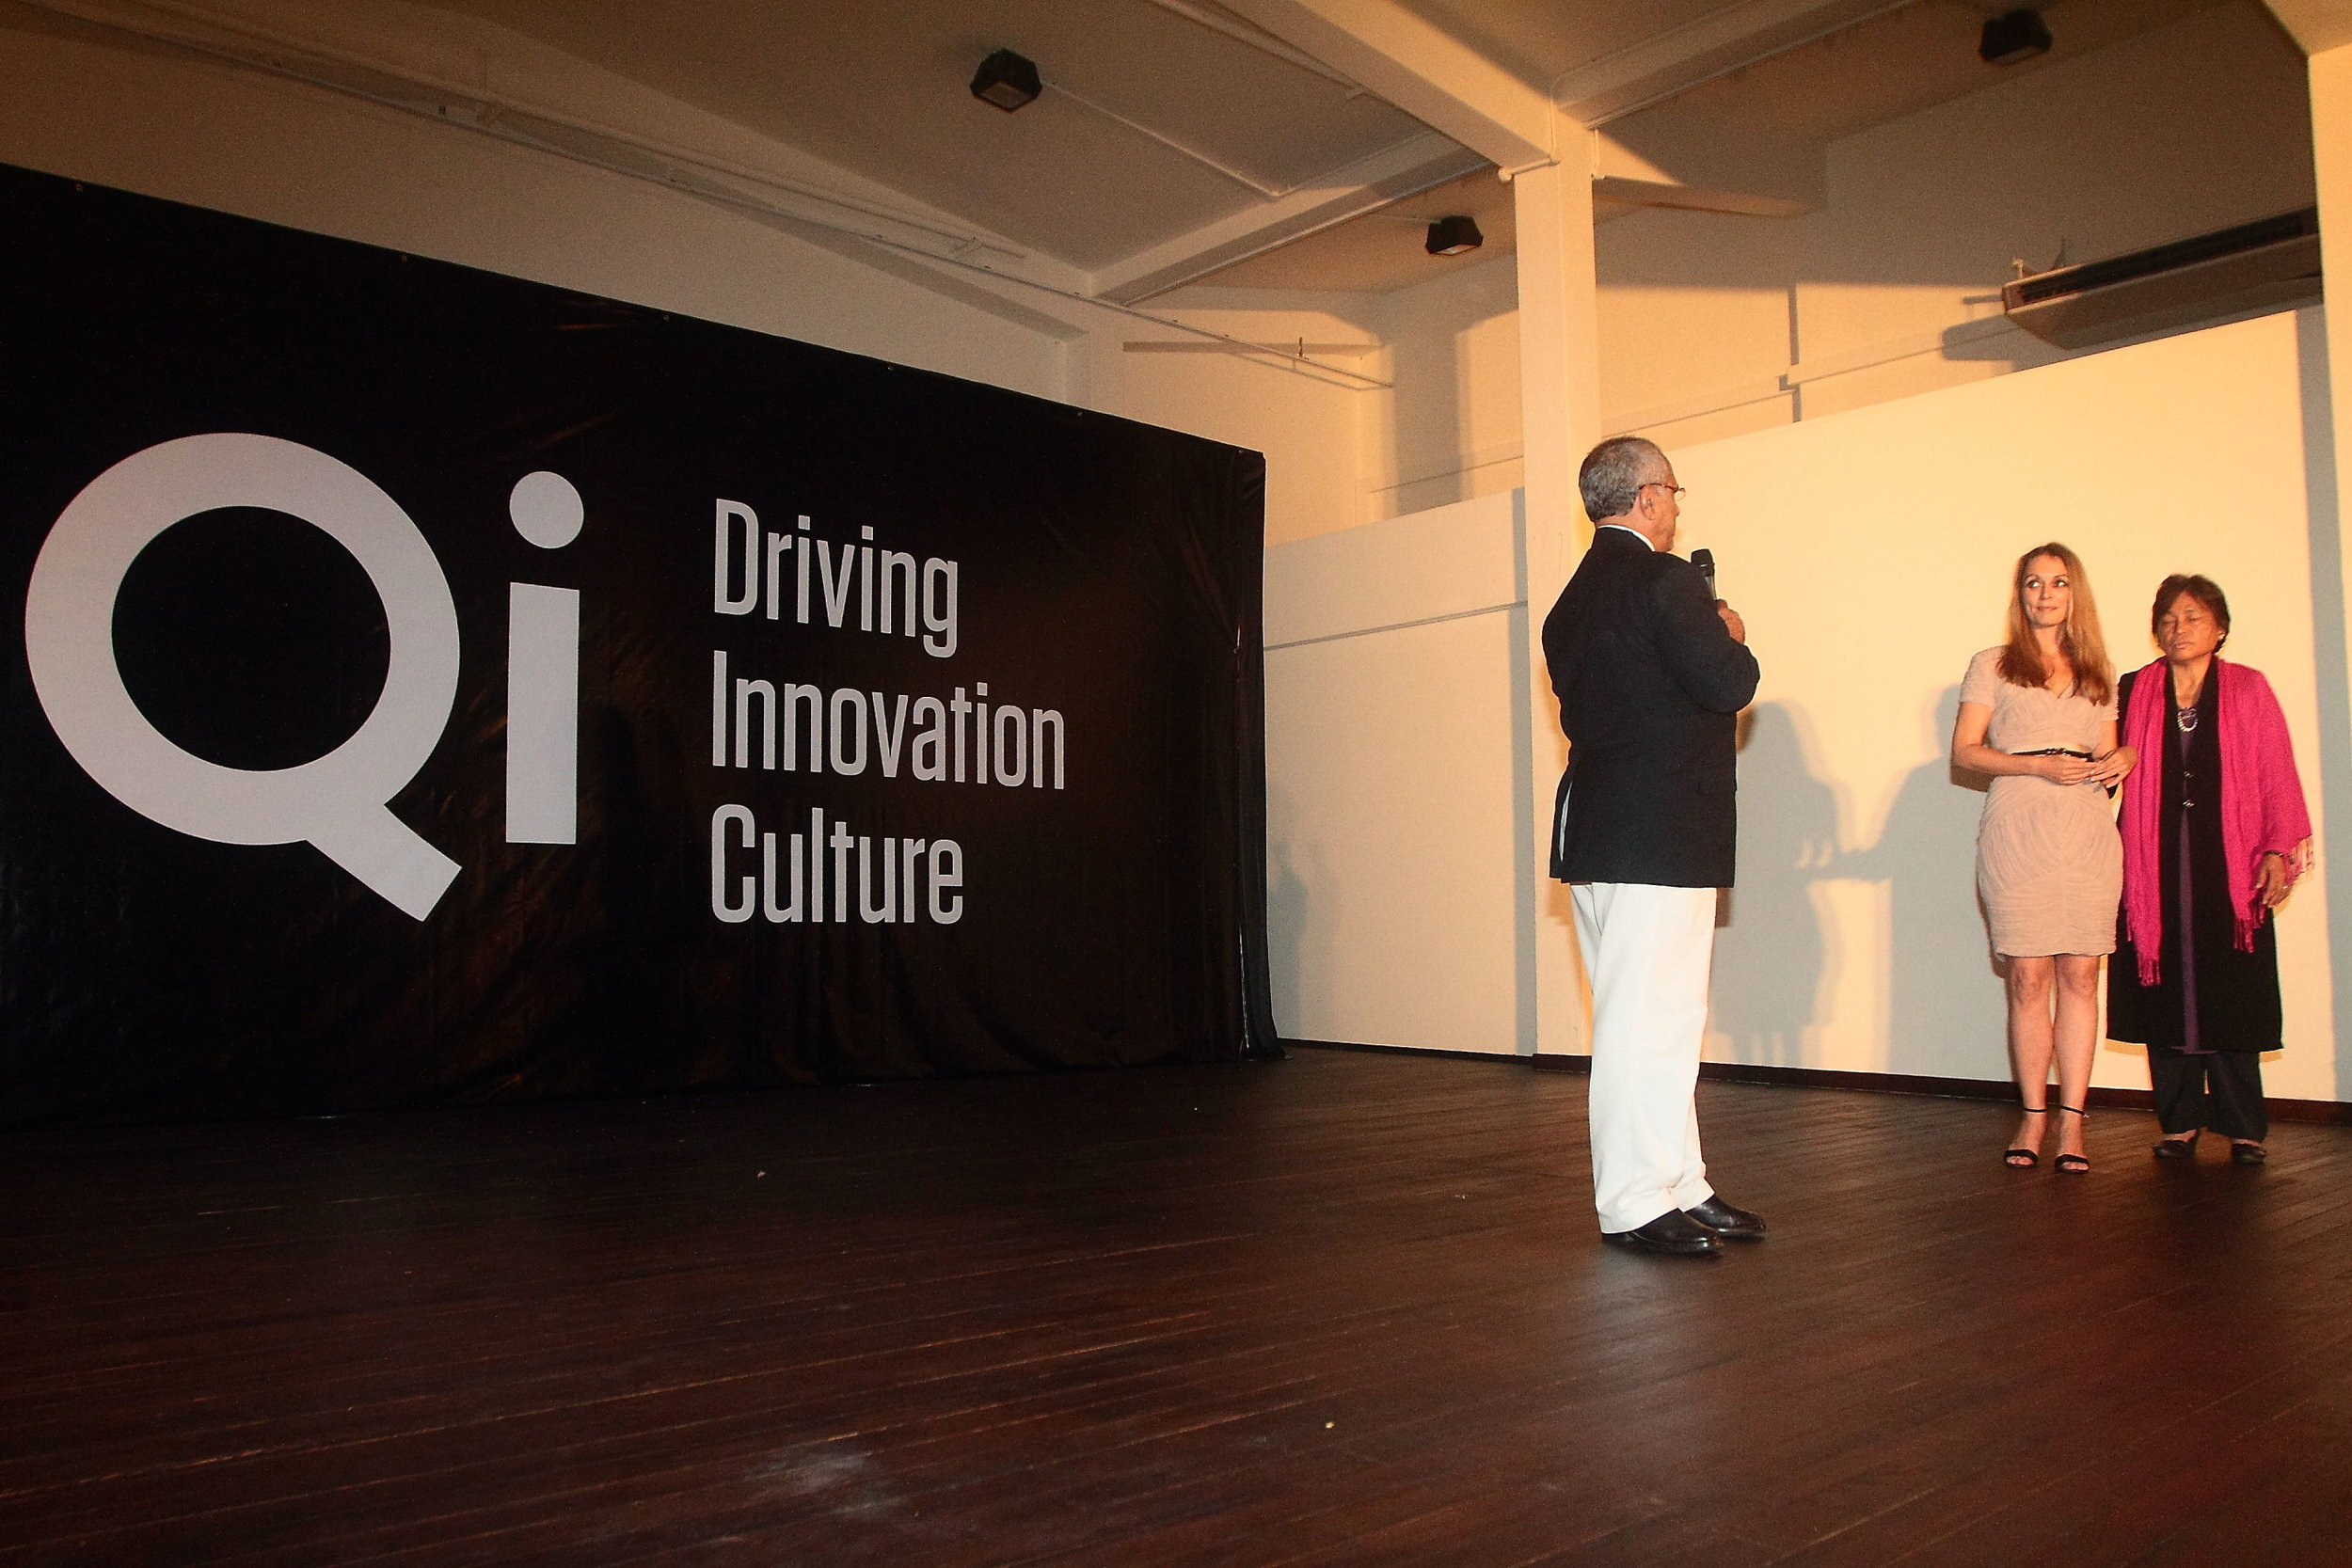 qi-global-2011-driving-innovation-culture-035.jpg